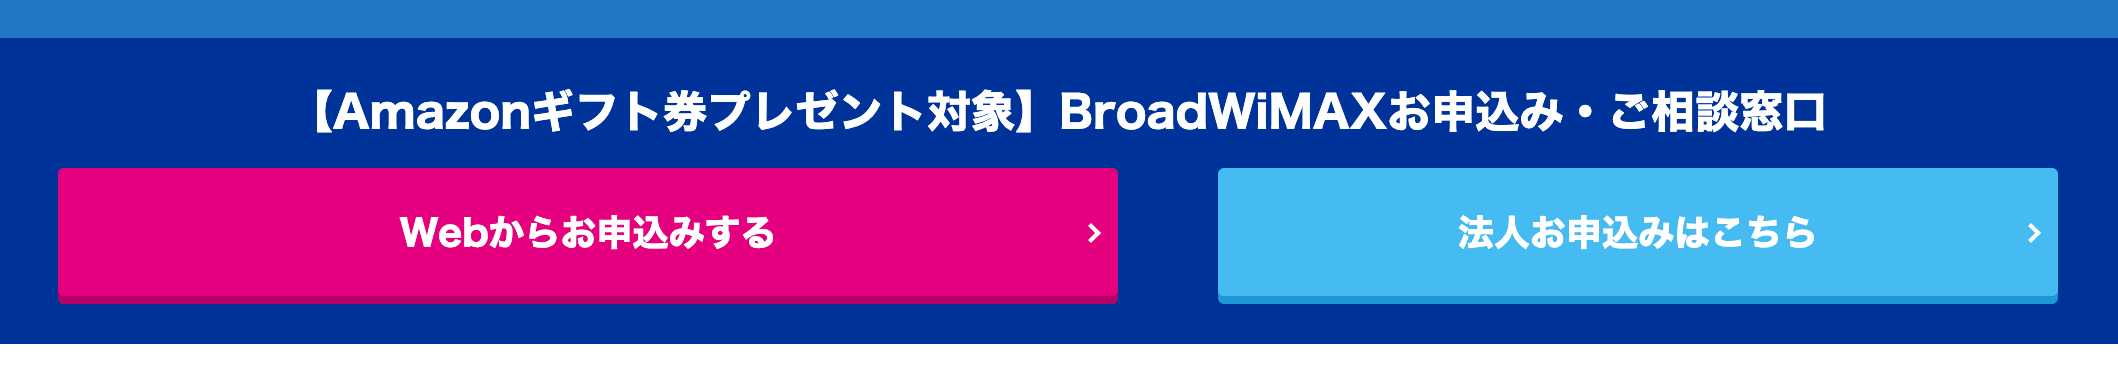 BroadWiMAXの法人申し込み